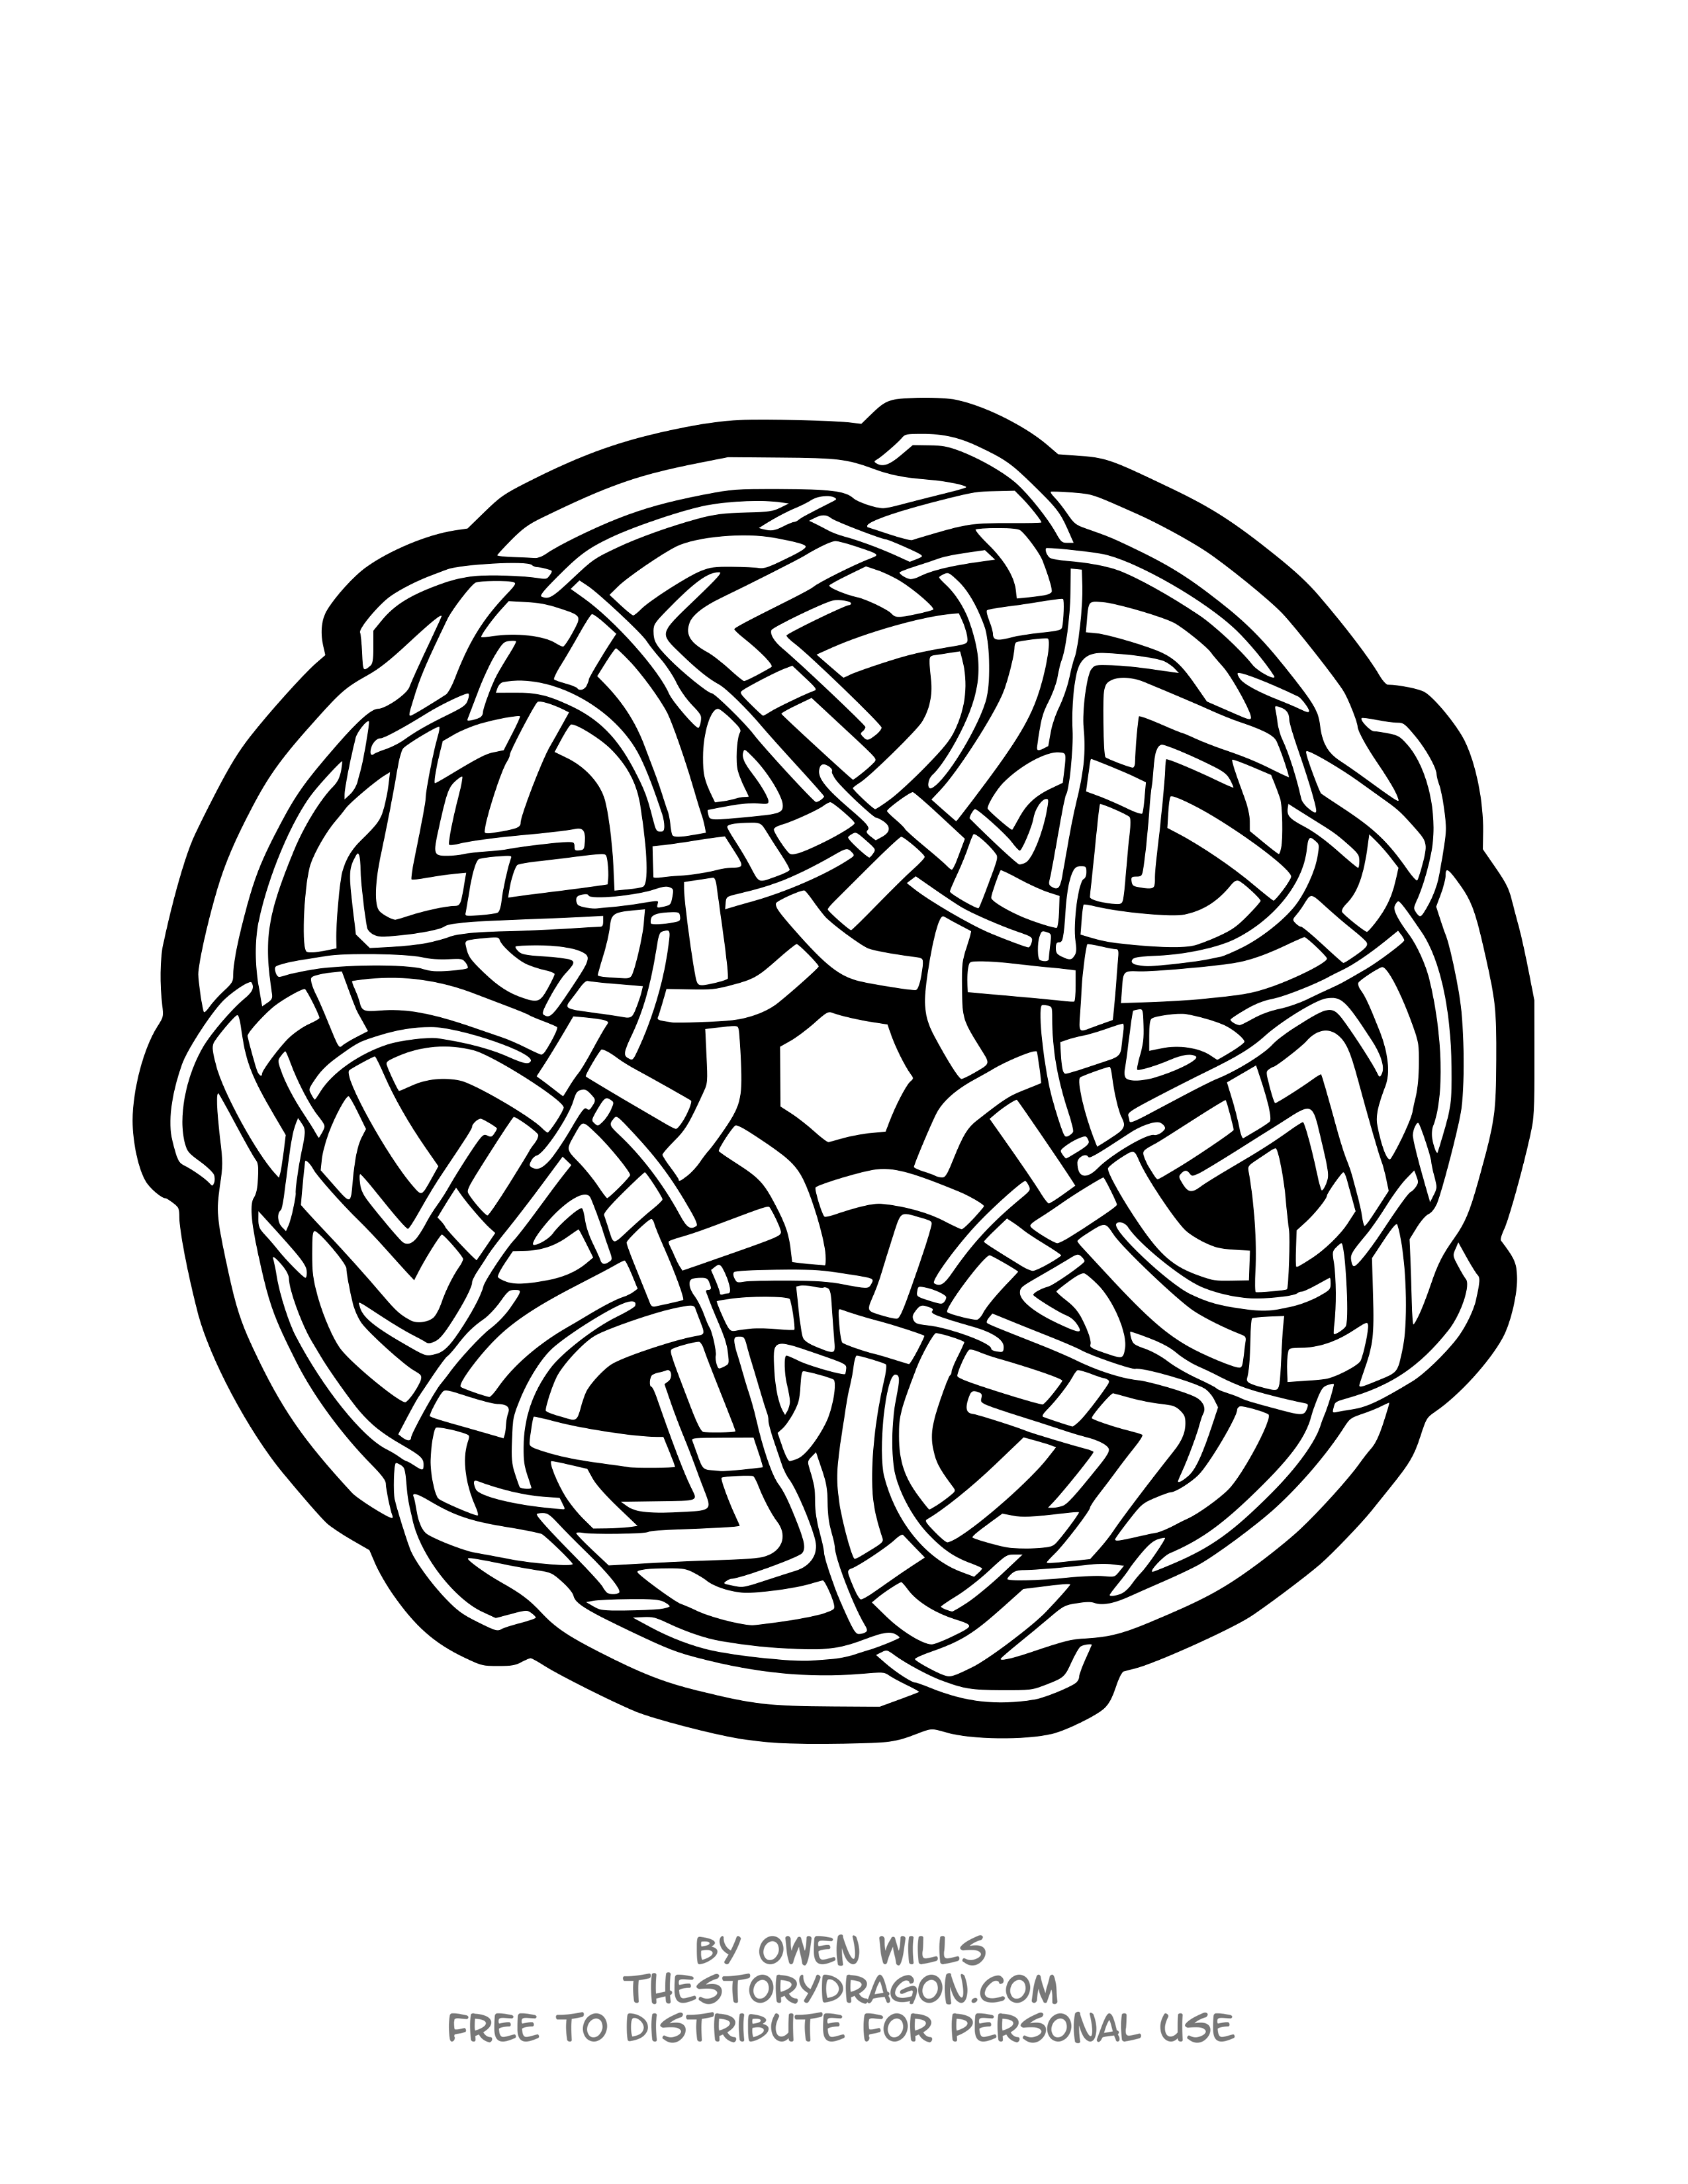 Mandala inspired by Celtic style